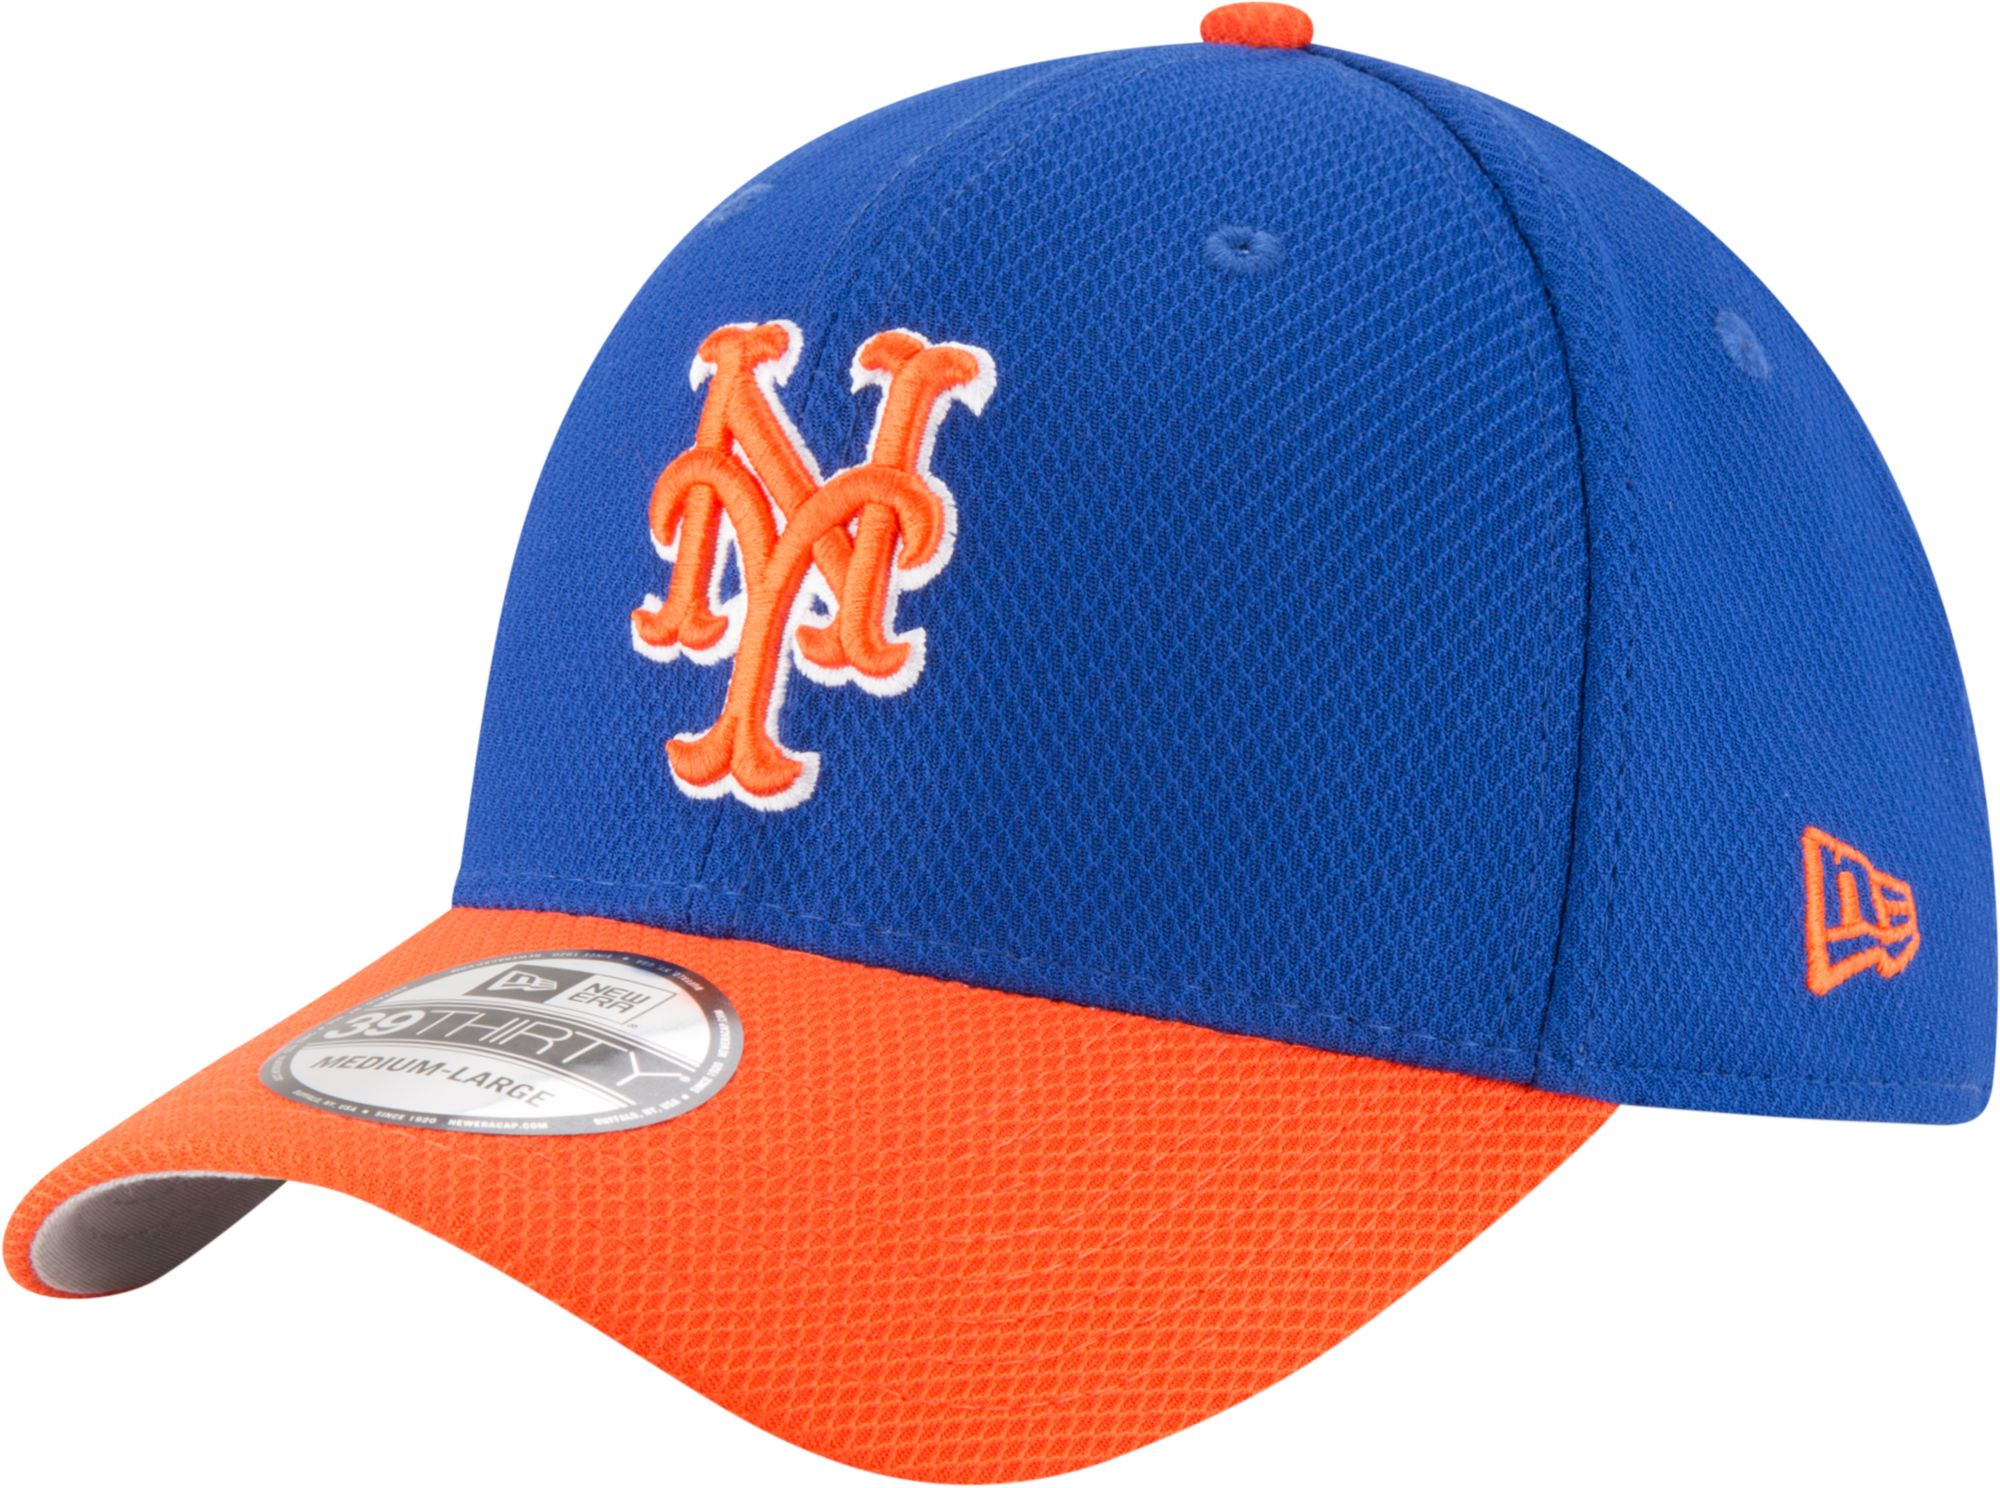 quality design 58a05 79d2e ... usa fitted cap new era mens new york mets 39thirty diamond era royal  orange flex hat